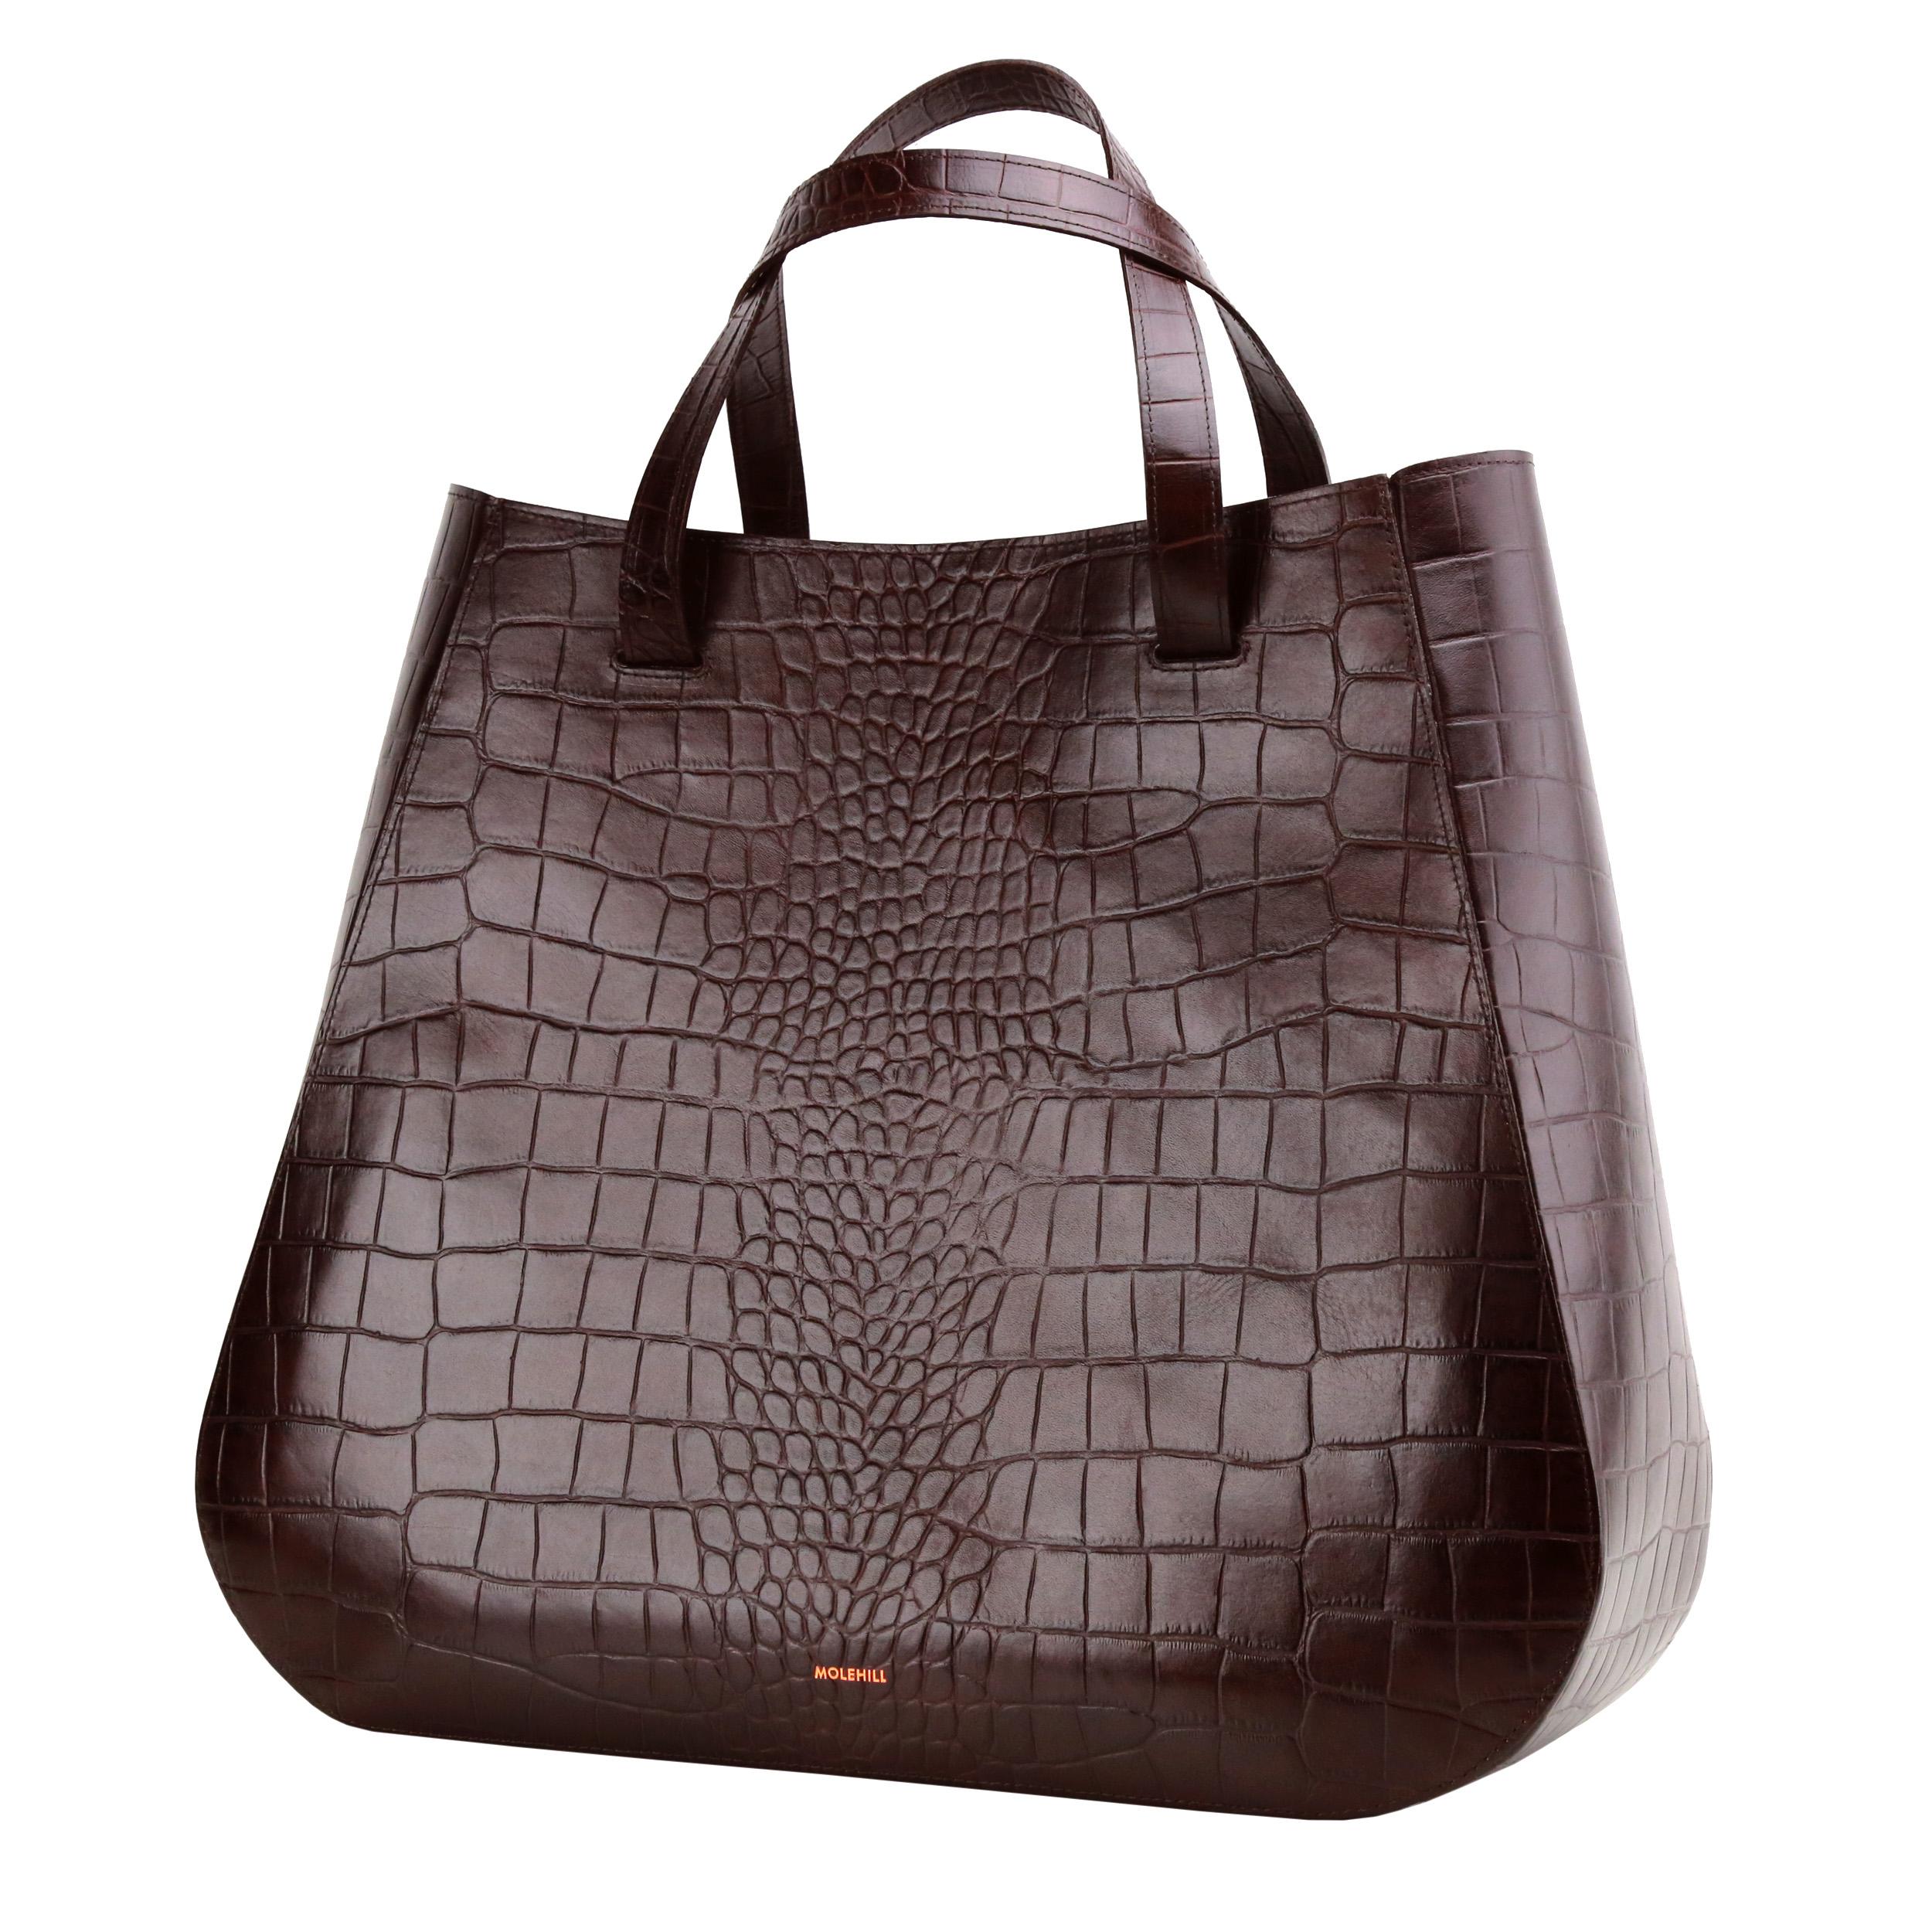 Lesla-Large-Bag-Brown-2